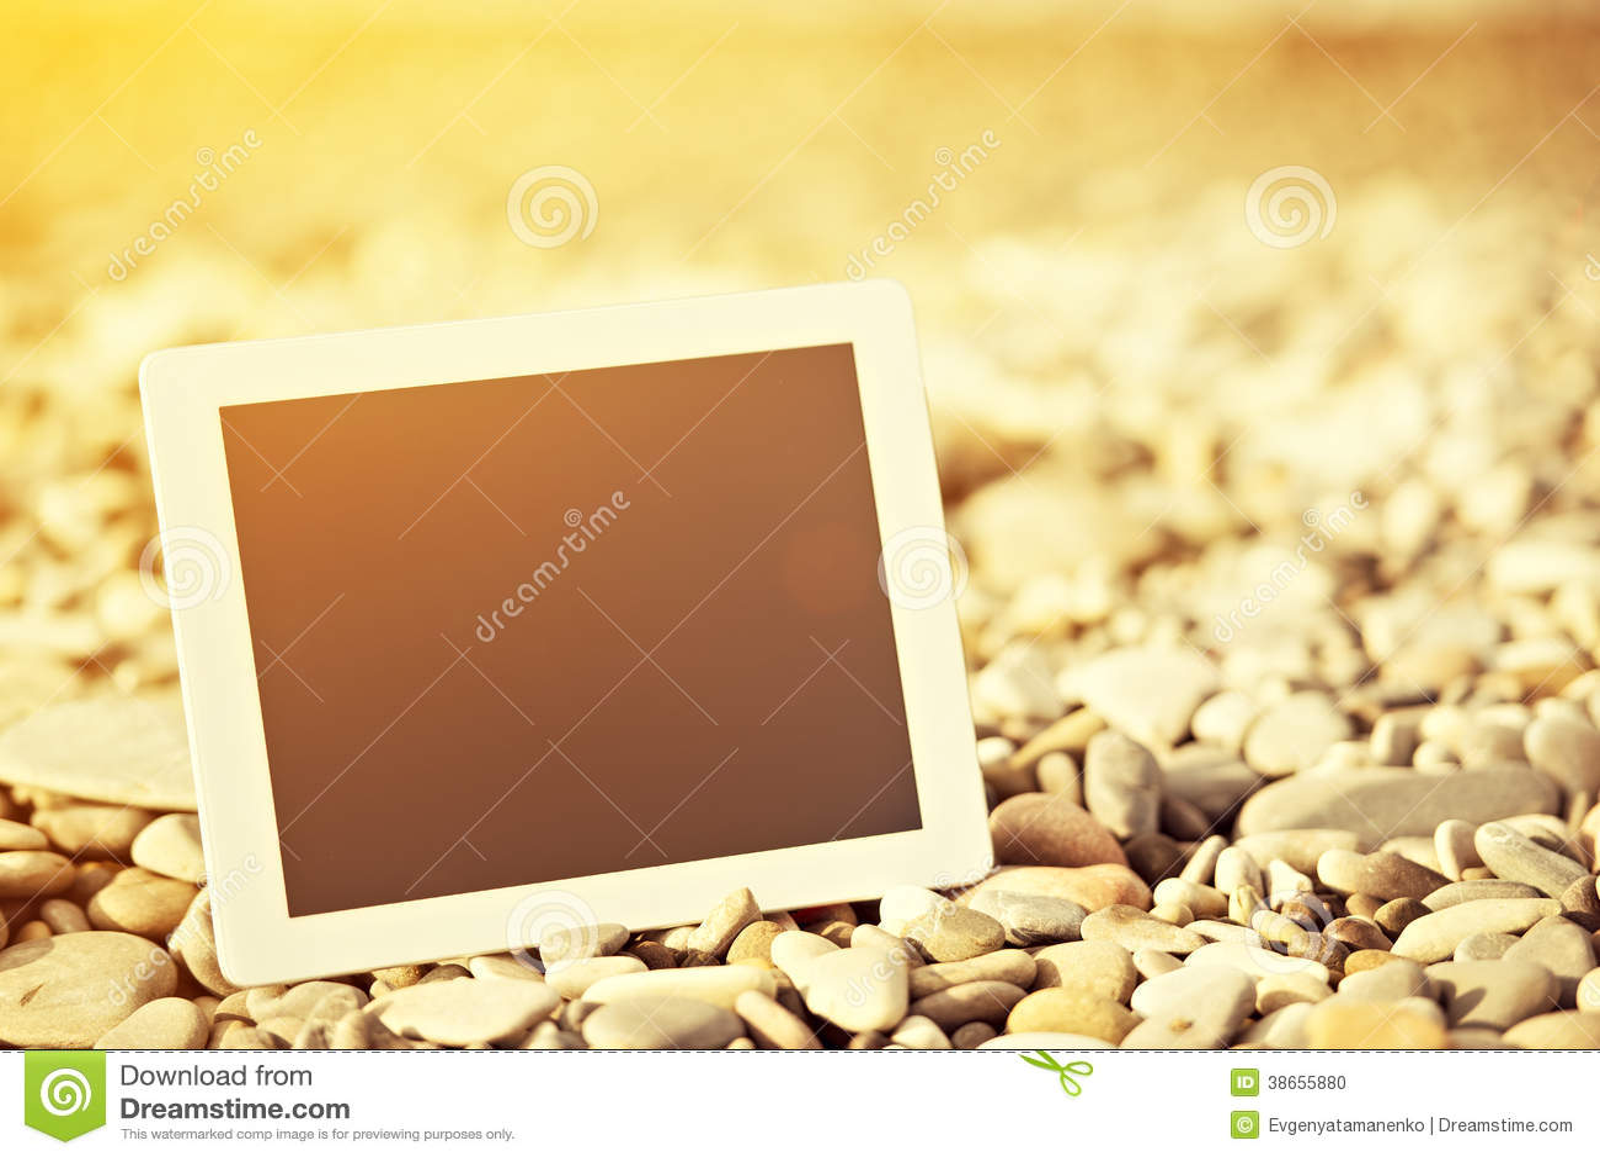 Concept Internet. lege tabletcomputer